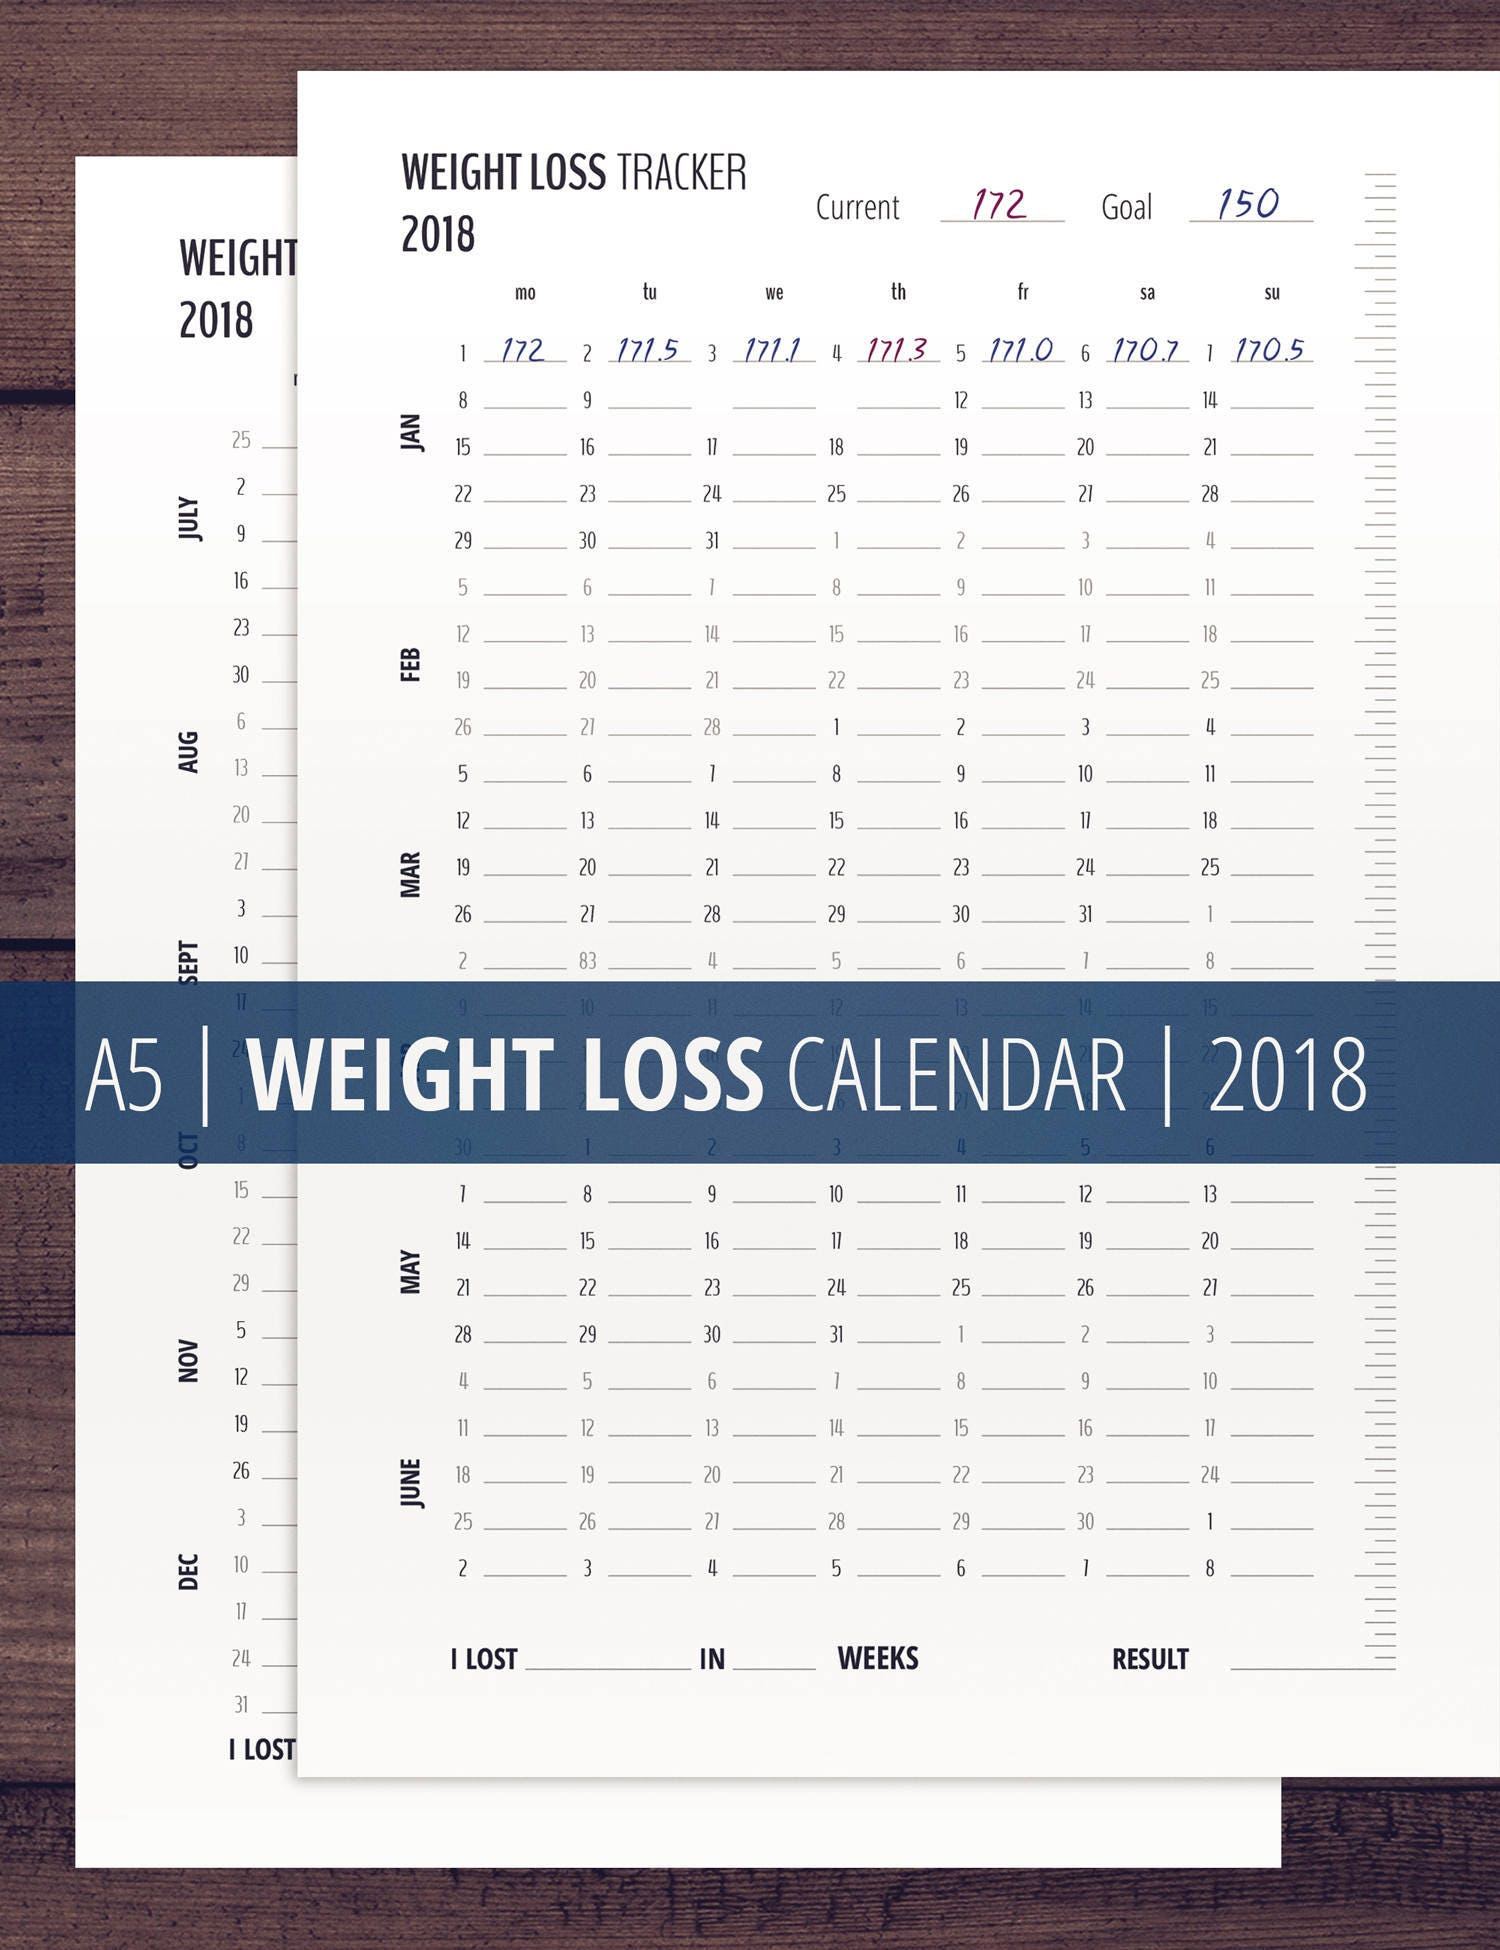 Weight loss tracker calendar 2018 a5 health planner inserts zoom geenschuldenfo Choice Image